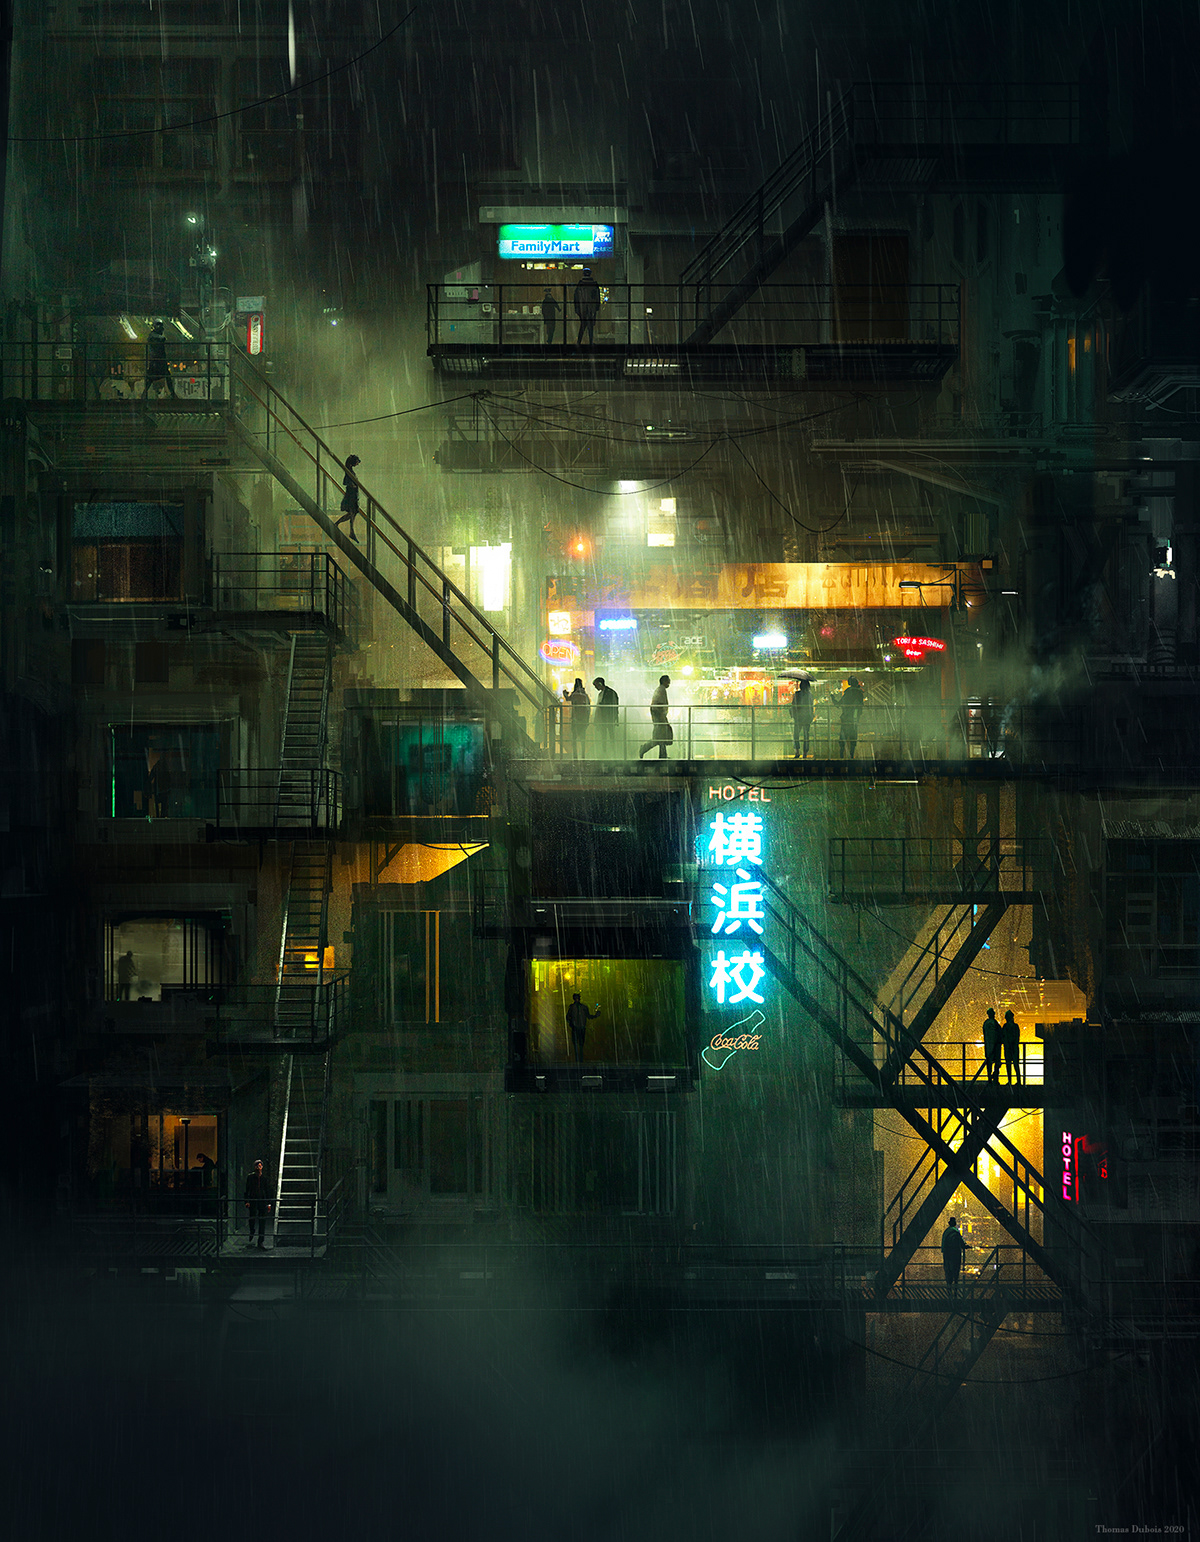 Feodora, a dystopian-inspired art series